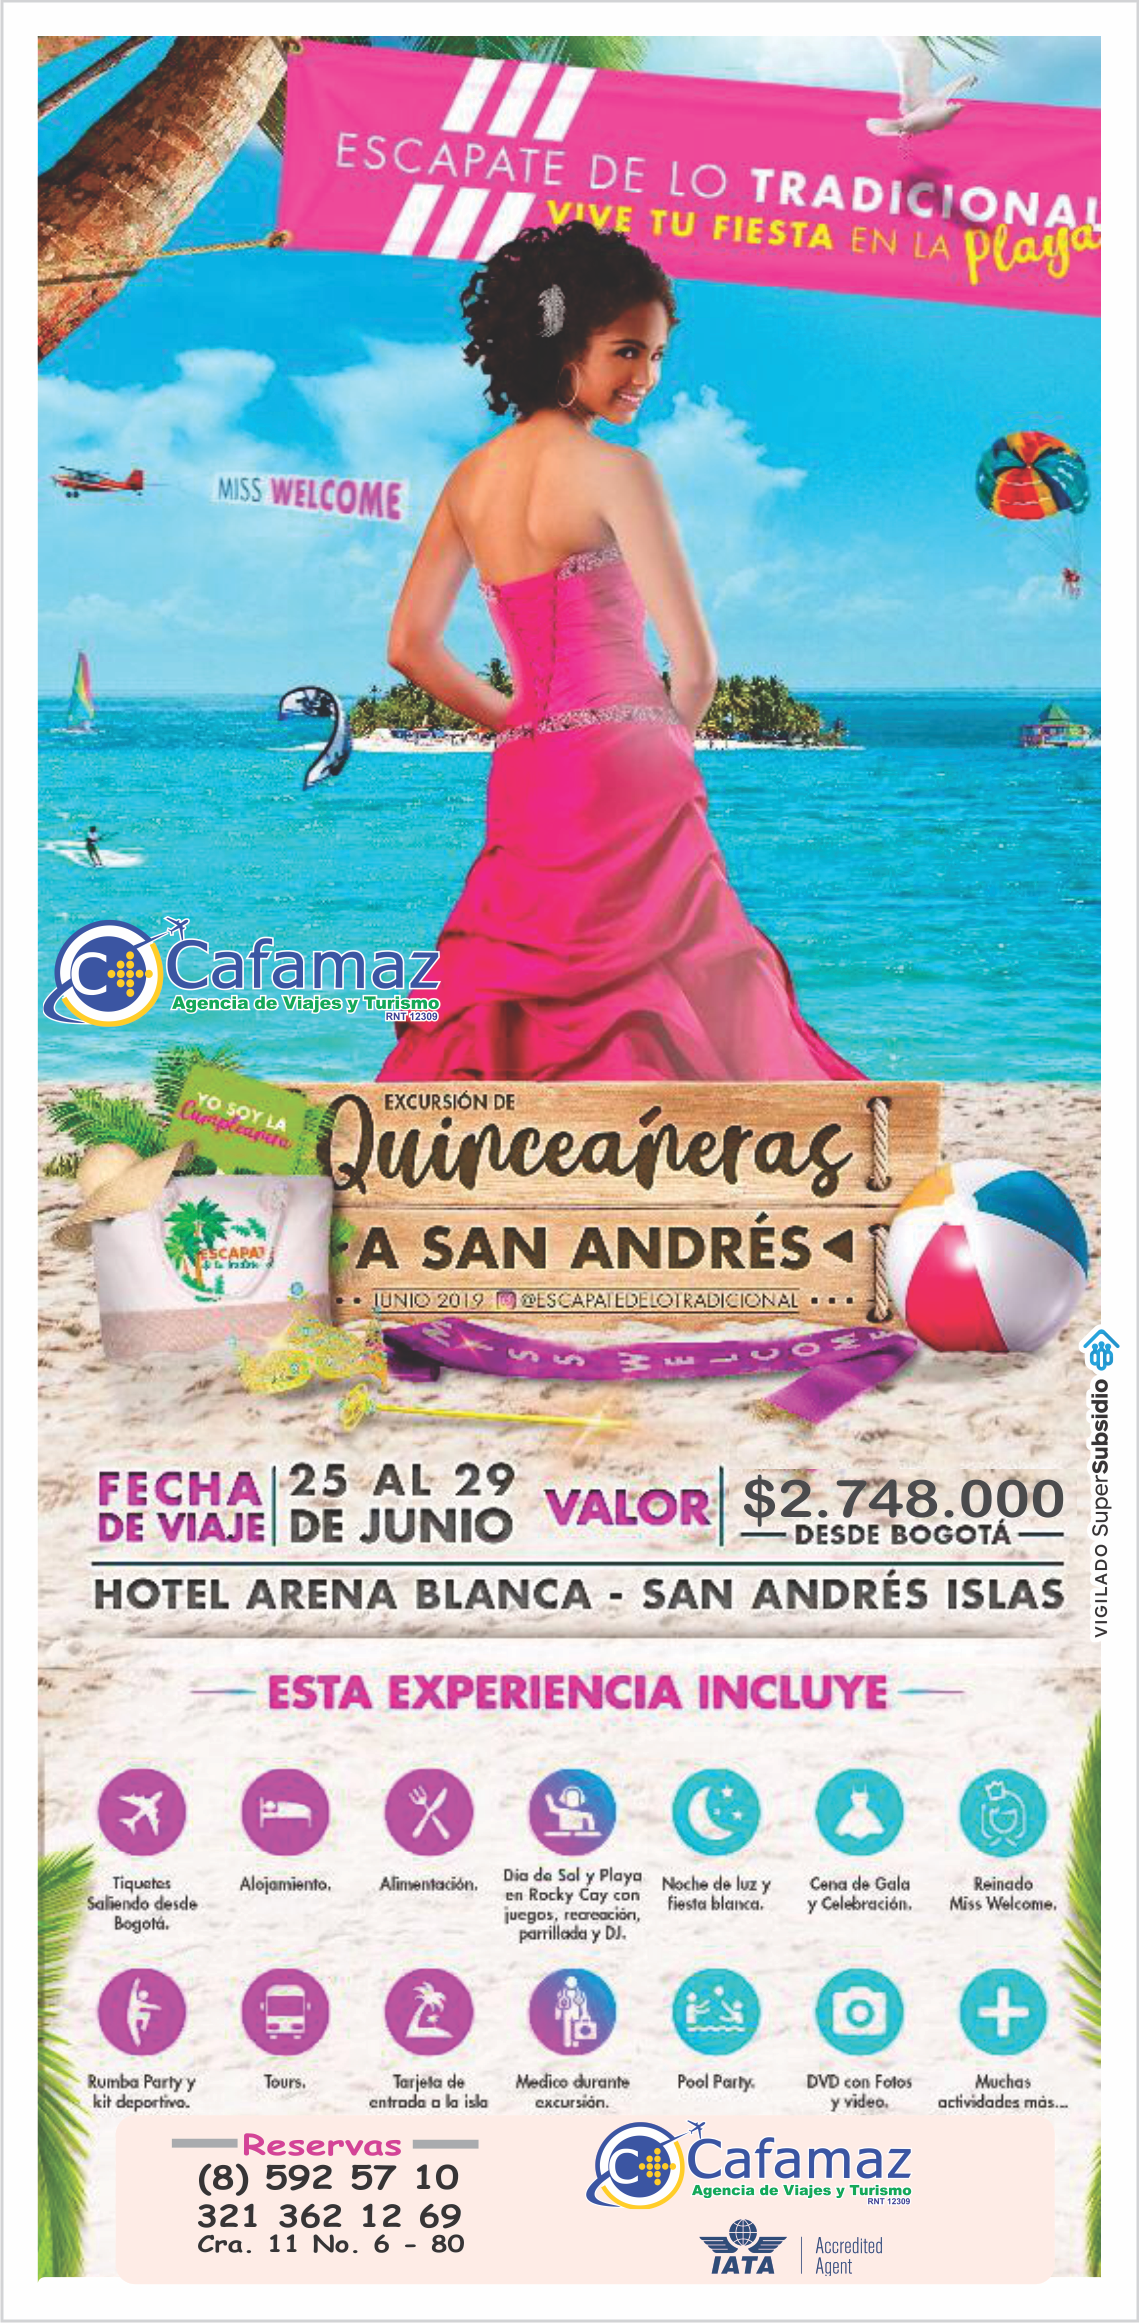 Quinceañeras a San Andrés